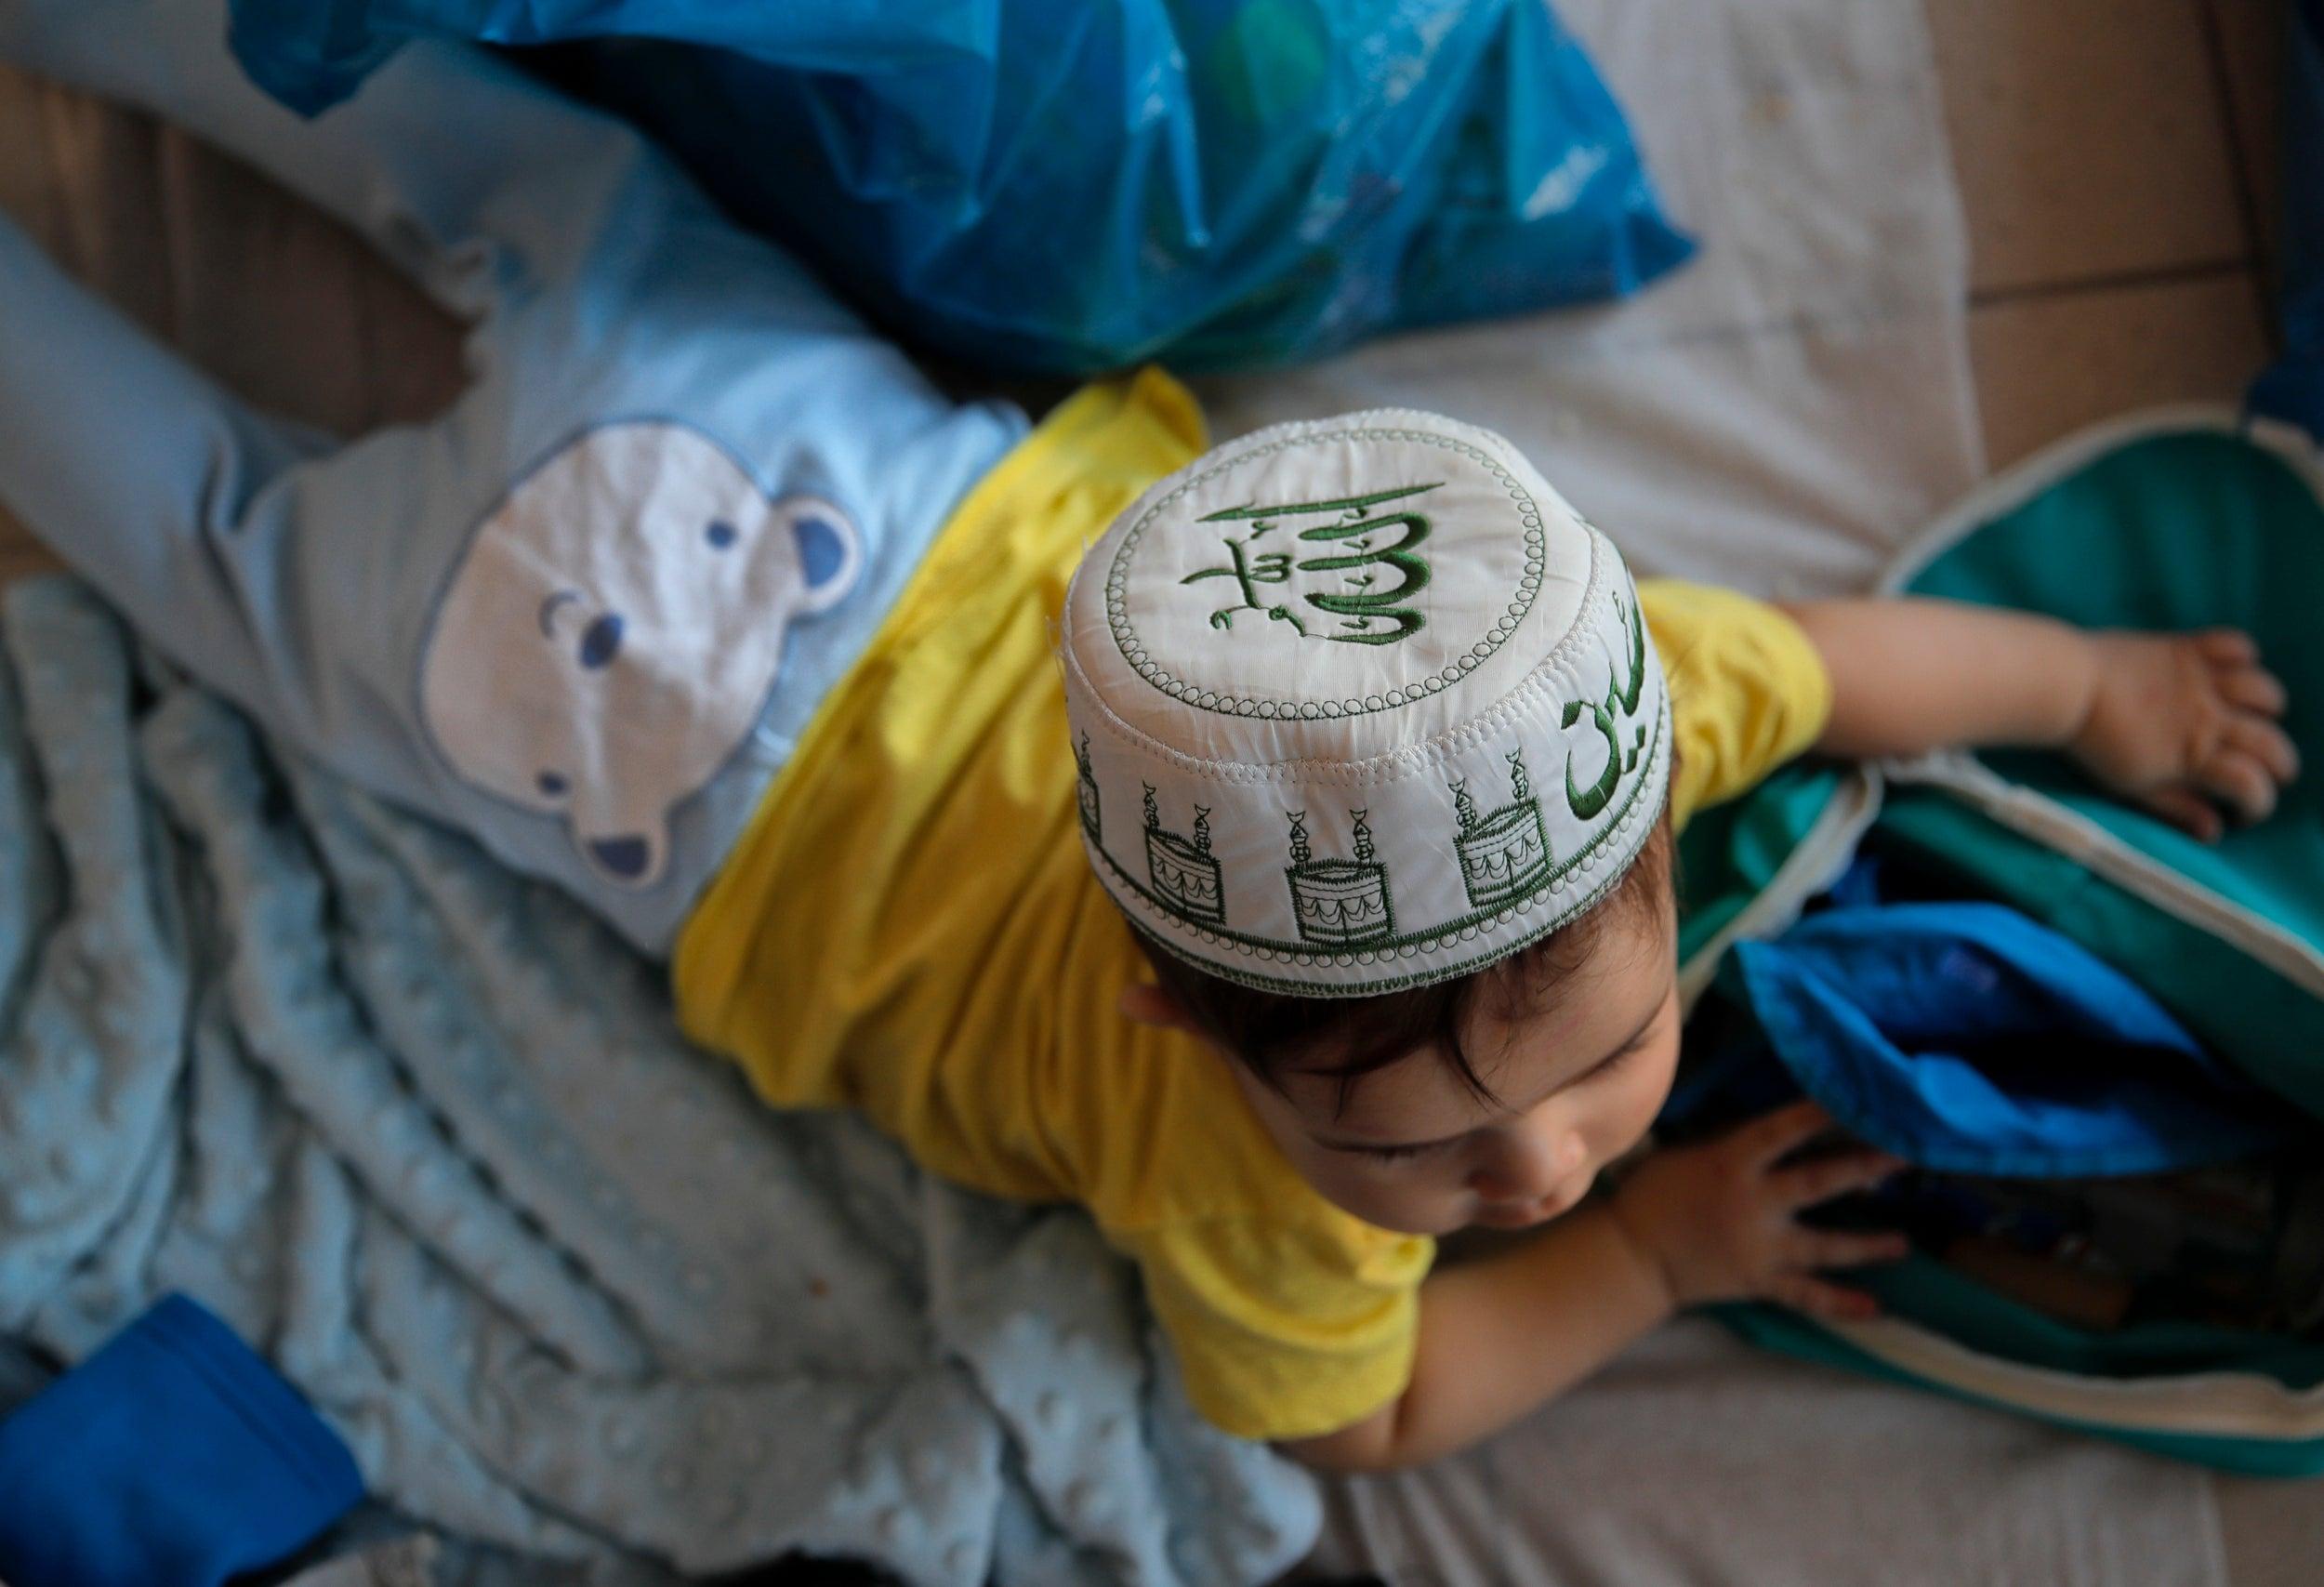 Eid al-Adha: Why do Muslims sacrifice animals and where is